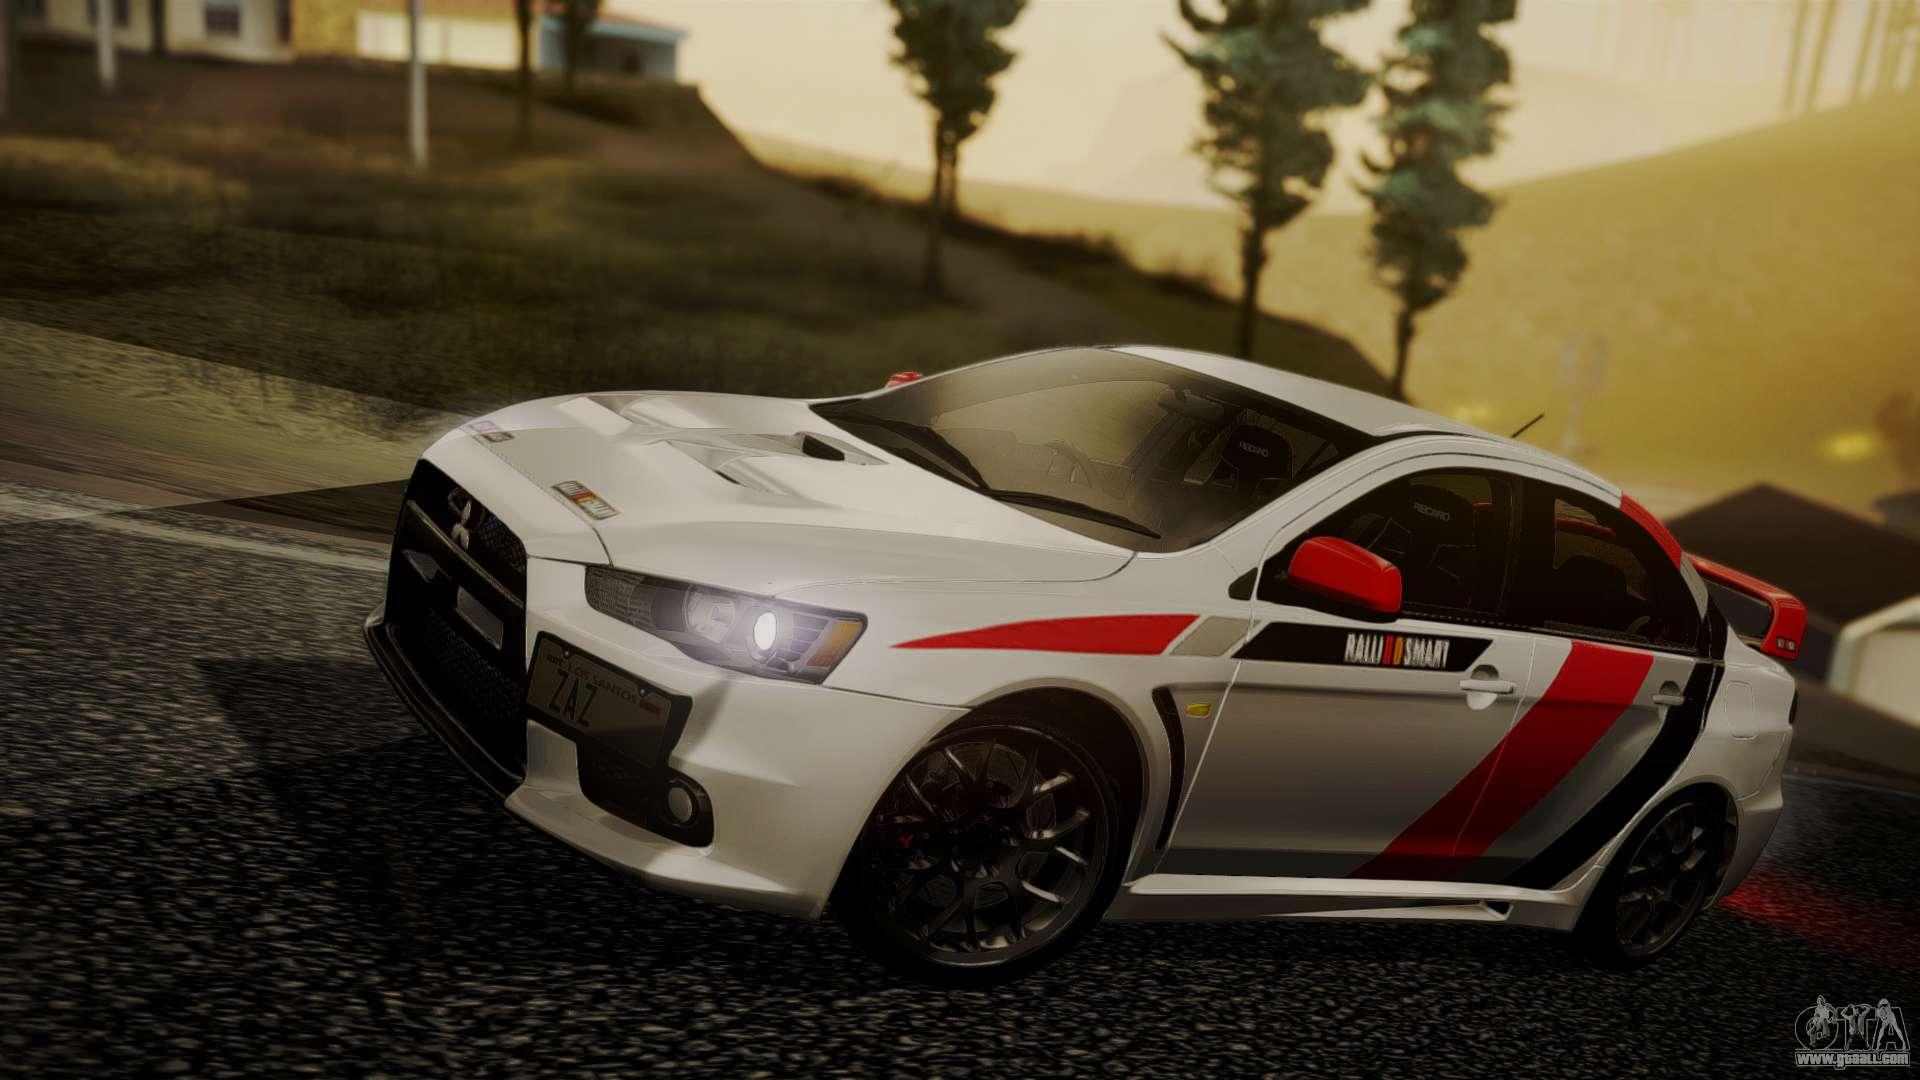 Gta 5 Custom Cars >> Mitsubishi Lancer Evolution X 2015 Final Edition for GTA ...